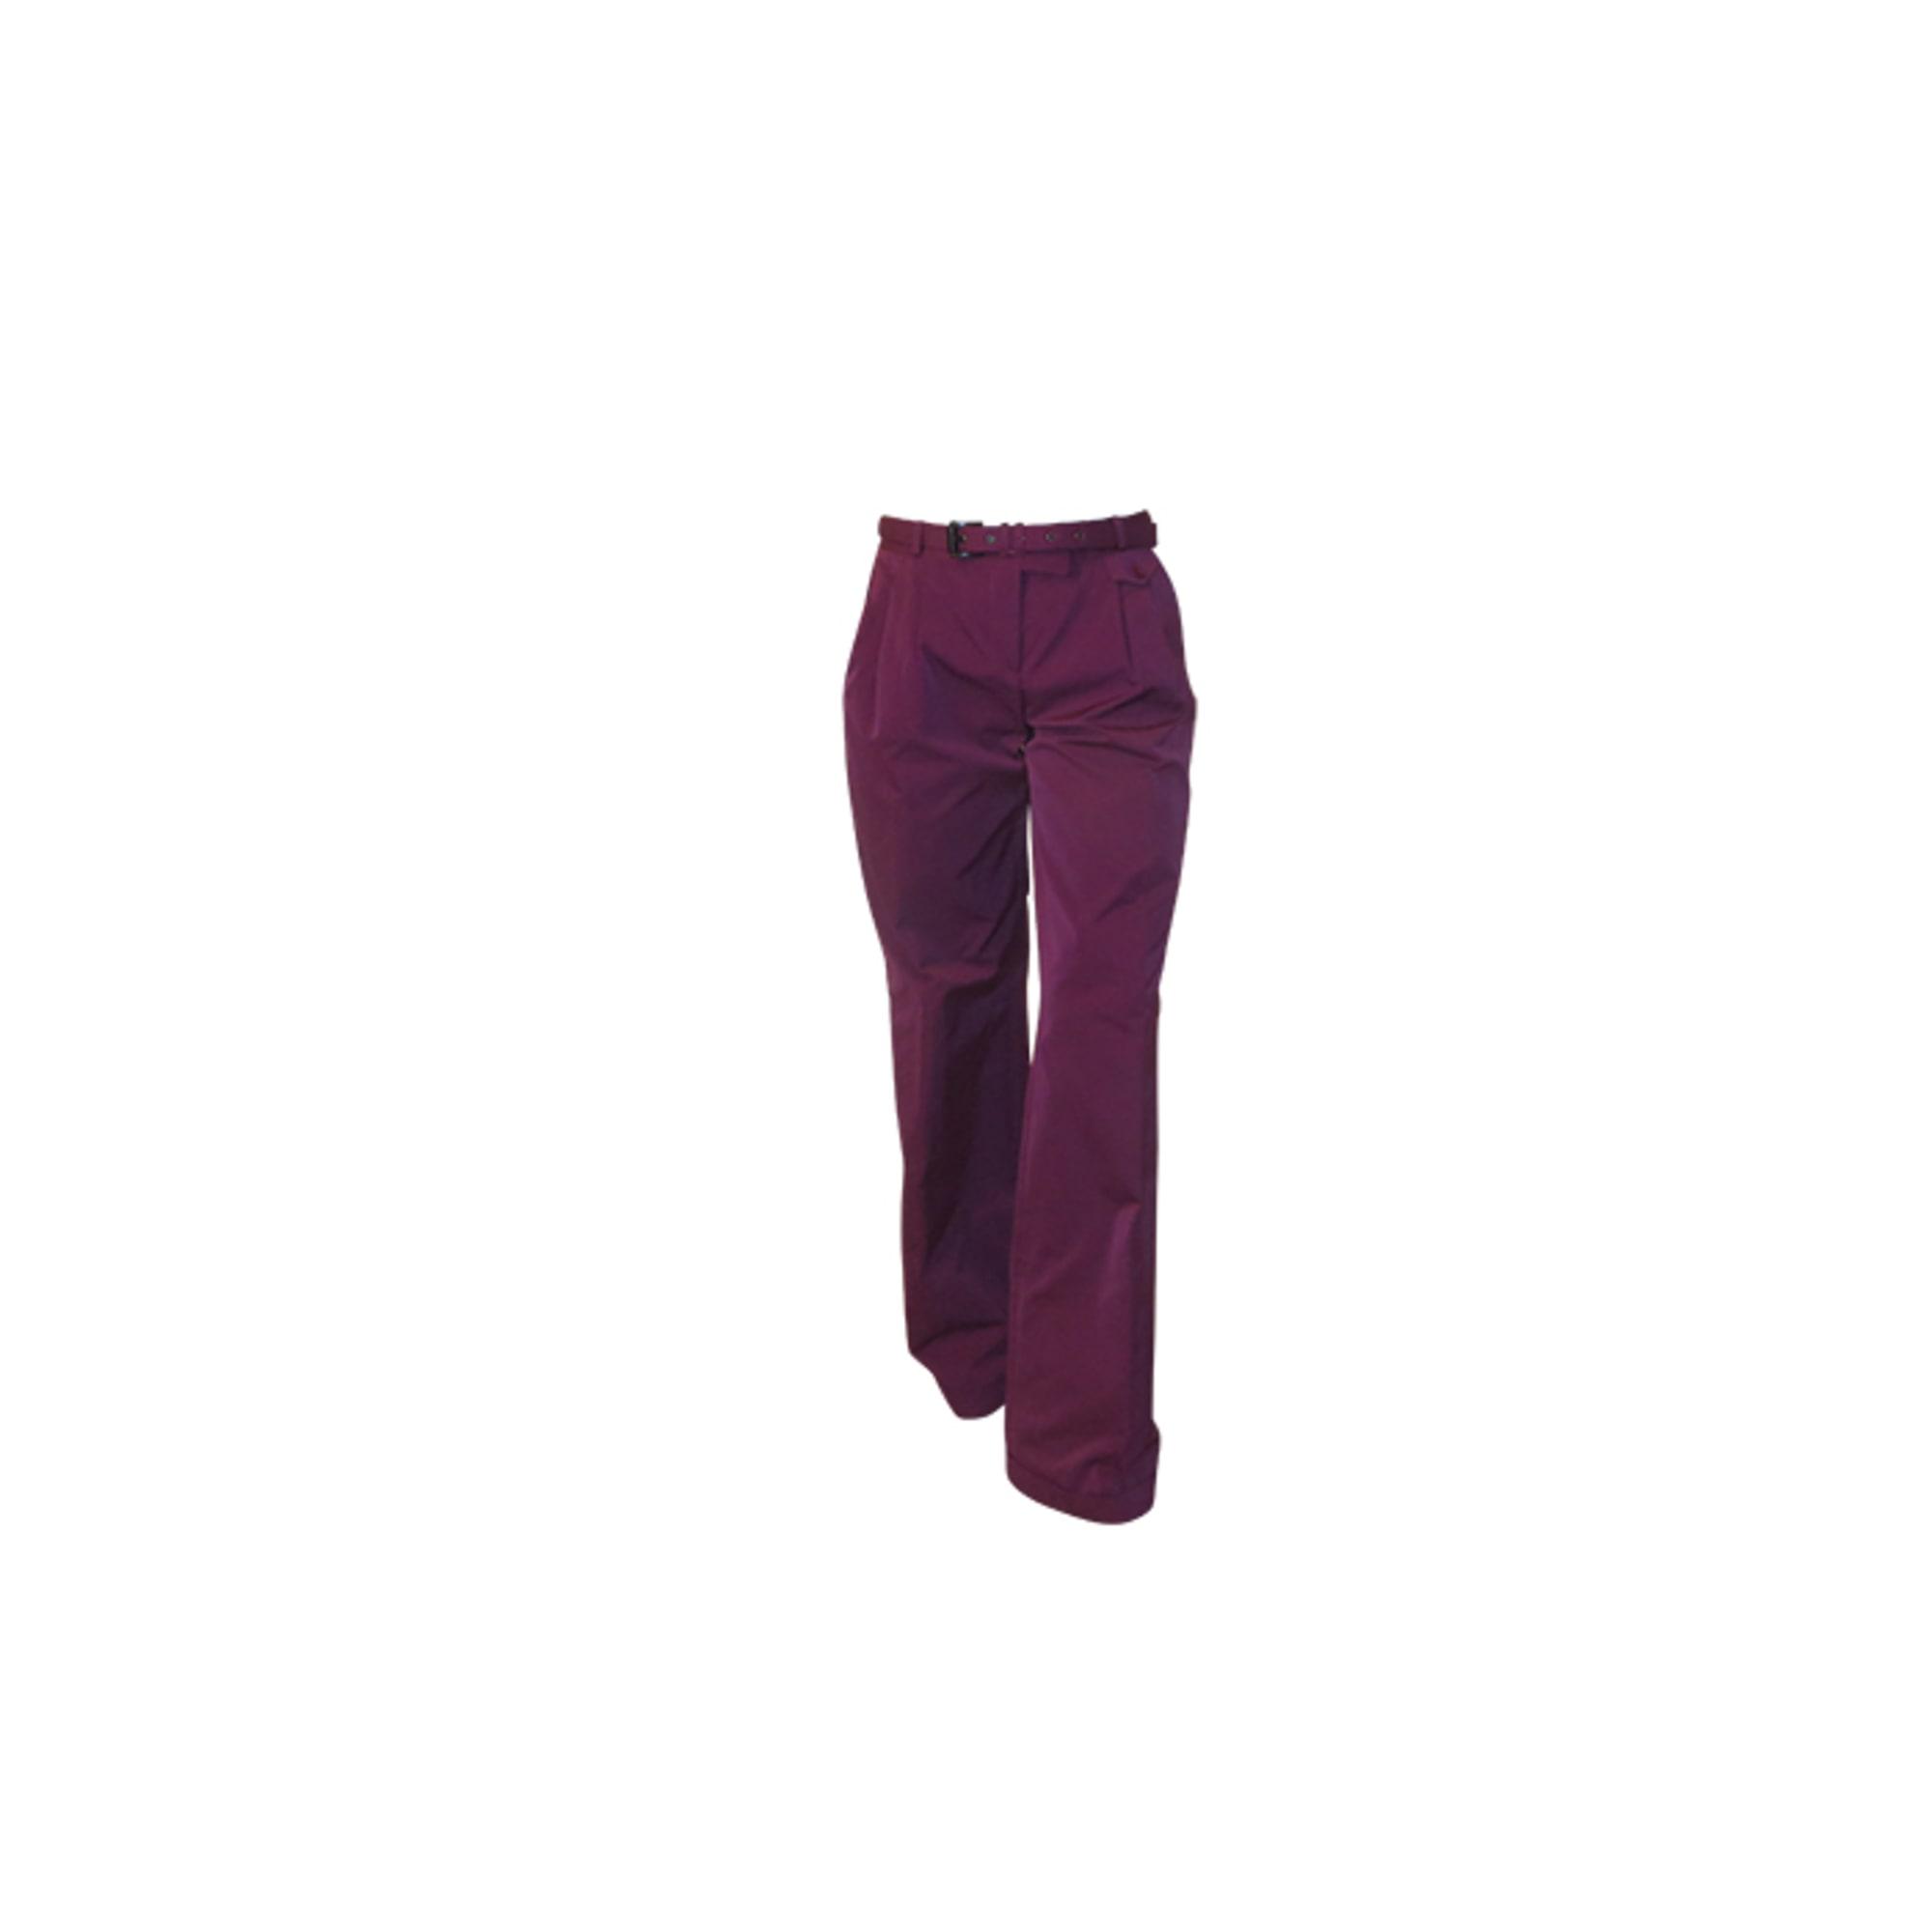 Pantalon large HUGO BOSS Rose, fuschia, vieux rose